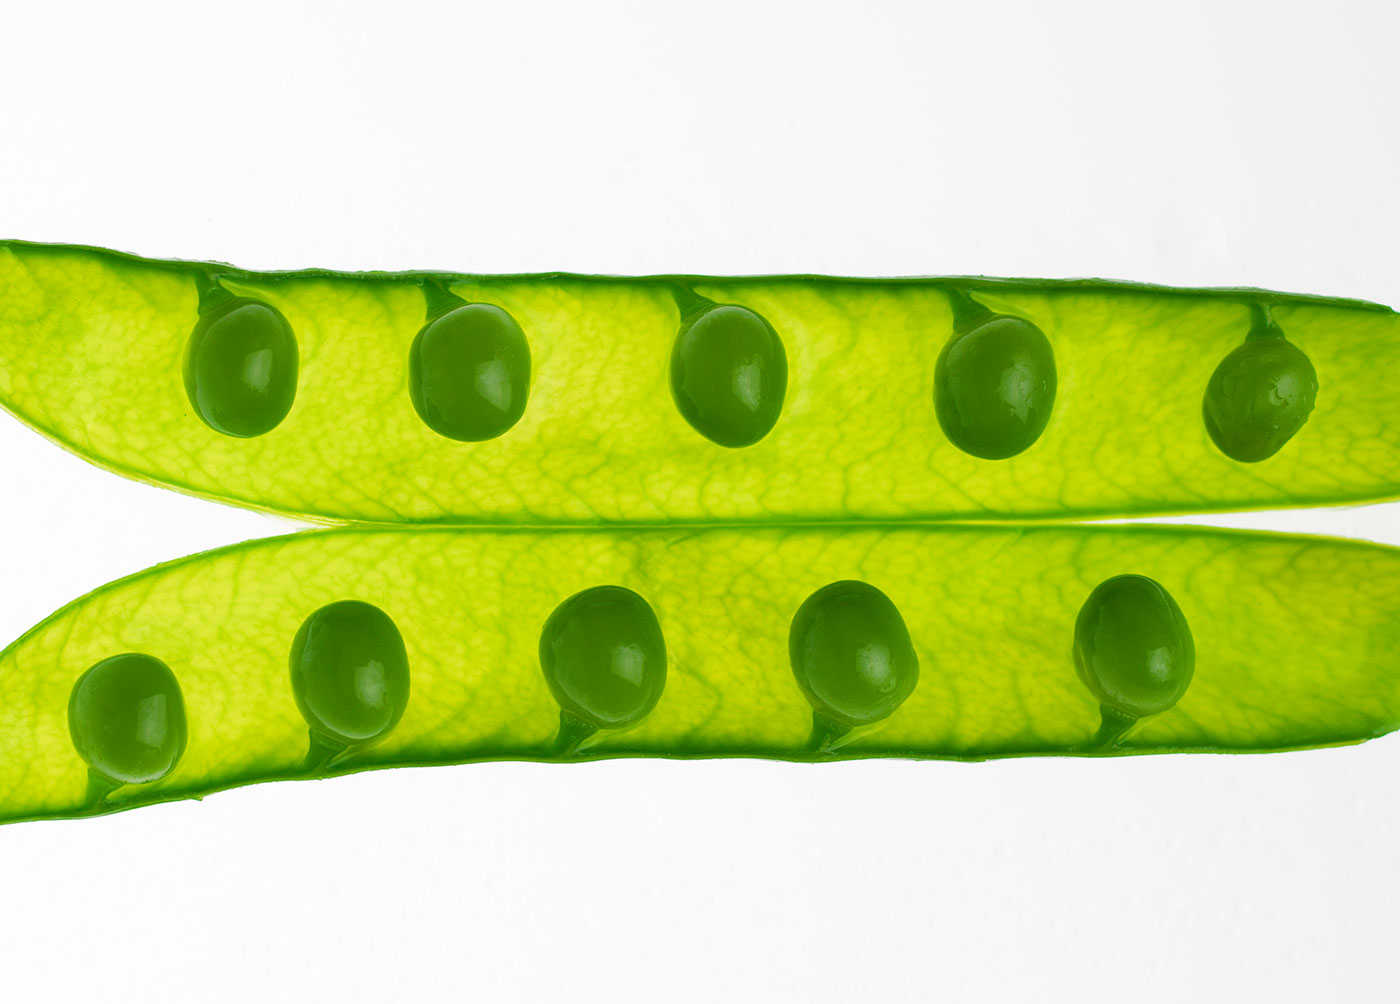 guisantes-loxe-mareiro-abastos2.0-elfotogastro-fotografo-de-comida-fotografo-gastronomico